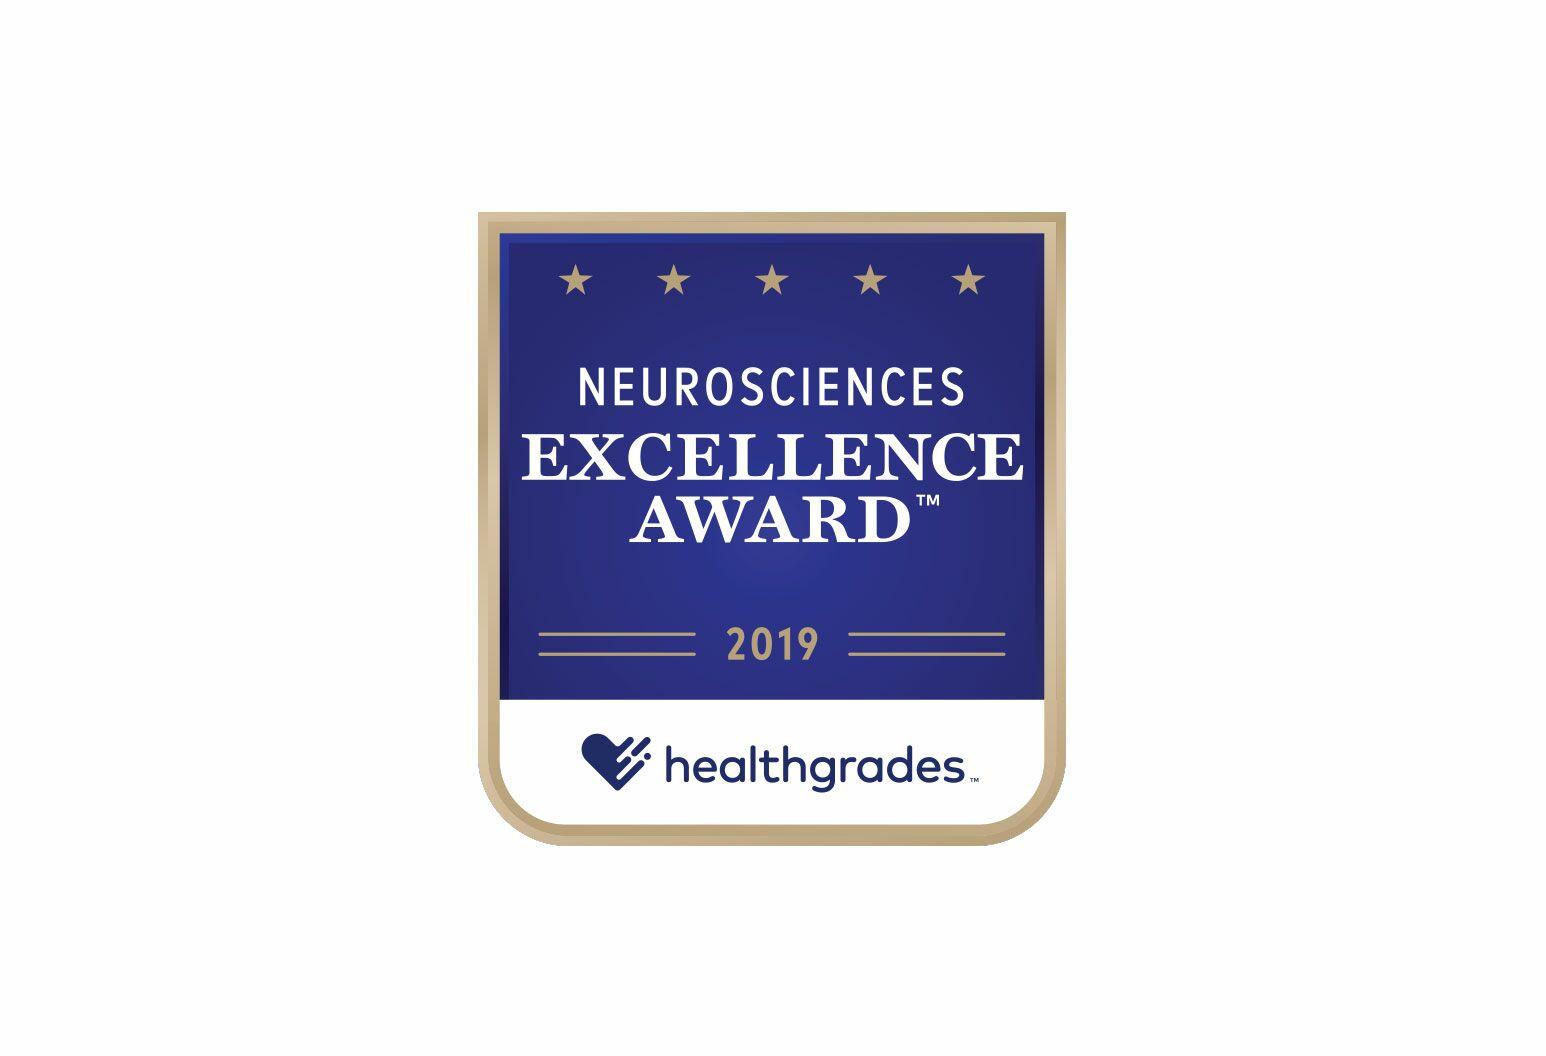 Neurosciences Excellence Award for 2019